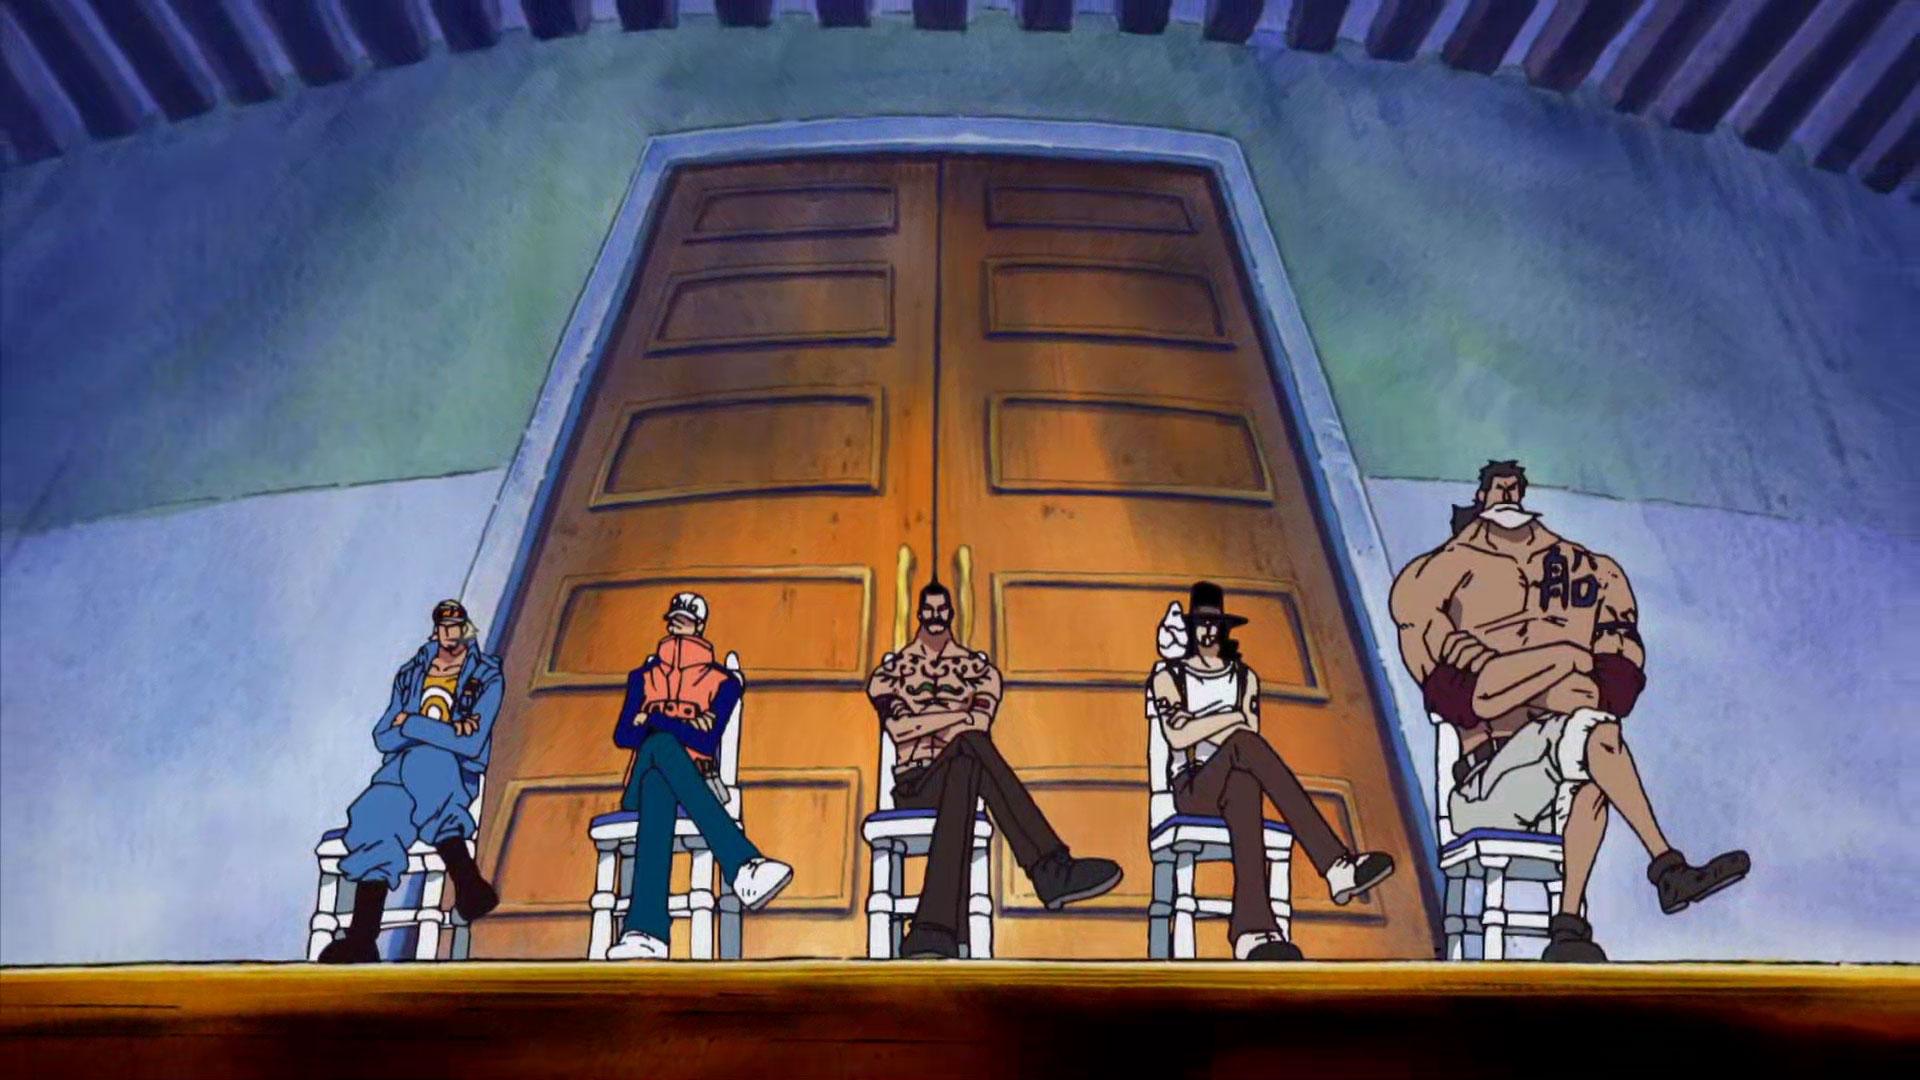 One-Piece-Water-7-Saga